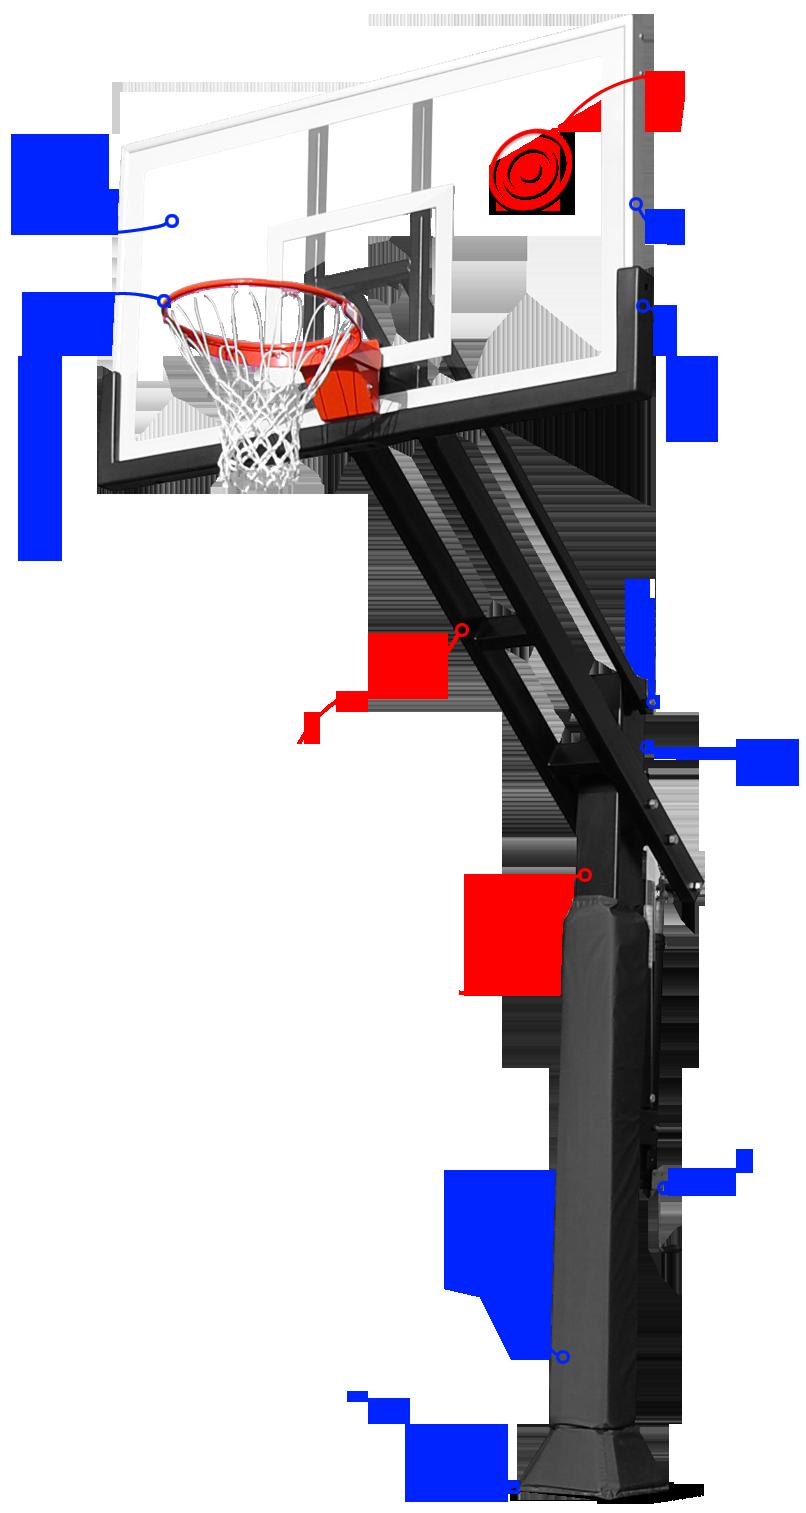 Rectangle backboard basketball hoop clipart image transparent library Pro Dunk Basketball Goals image transparent library